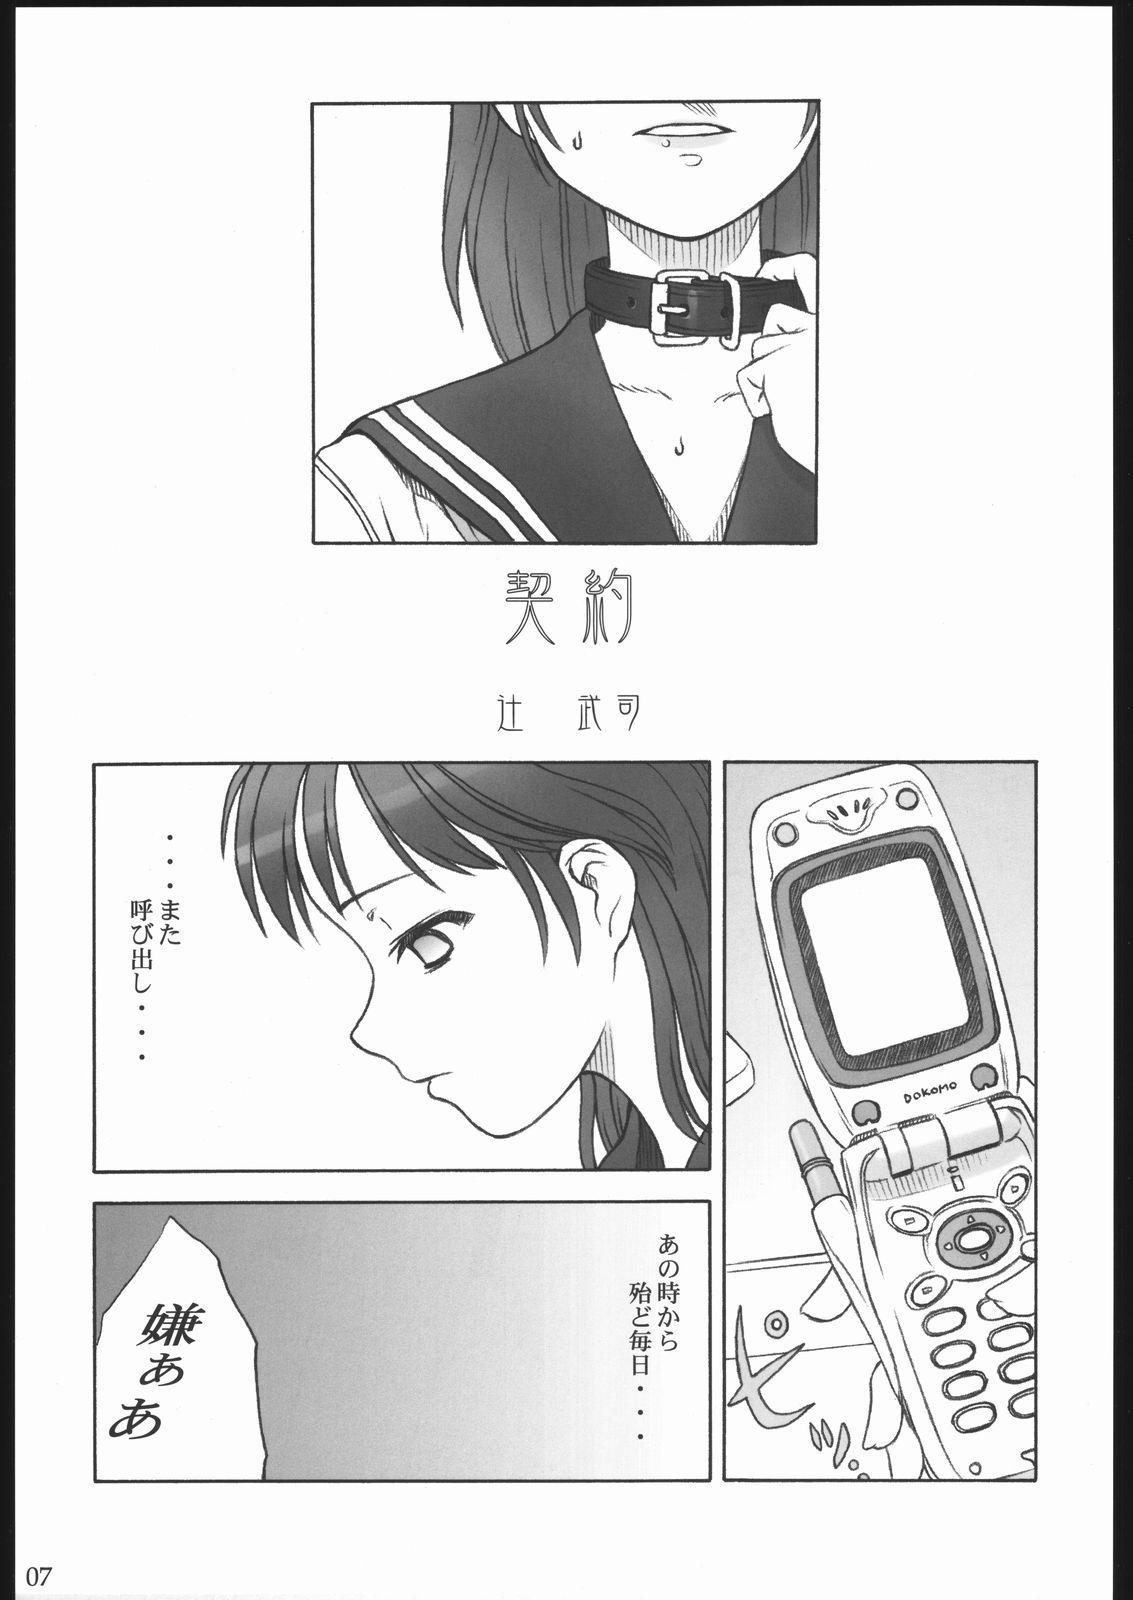 SACRIFICE Tsuji Takeshi Works Selection vol. 2 4